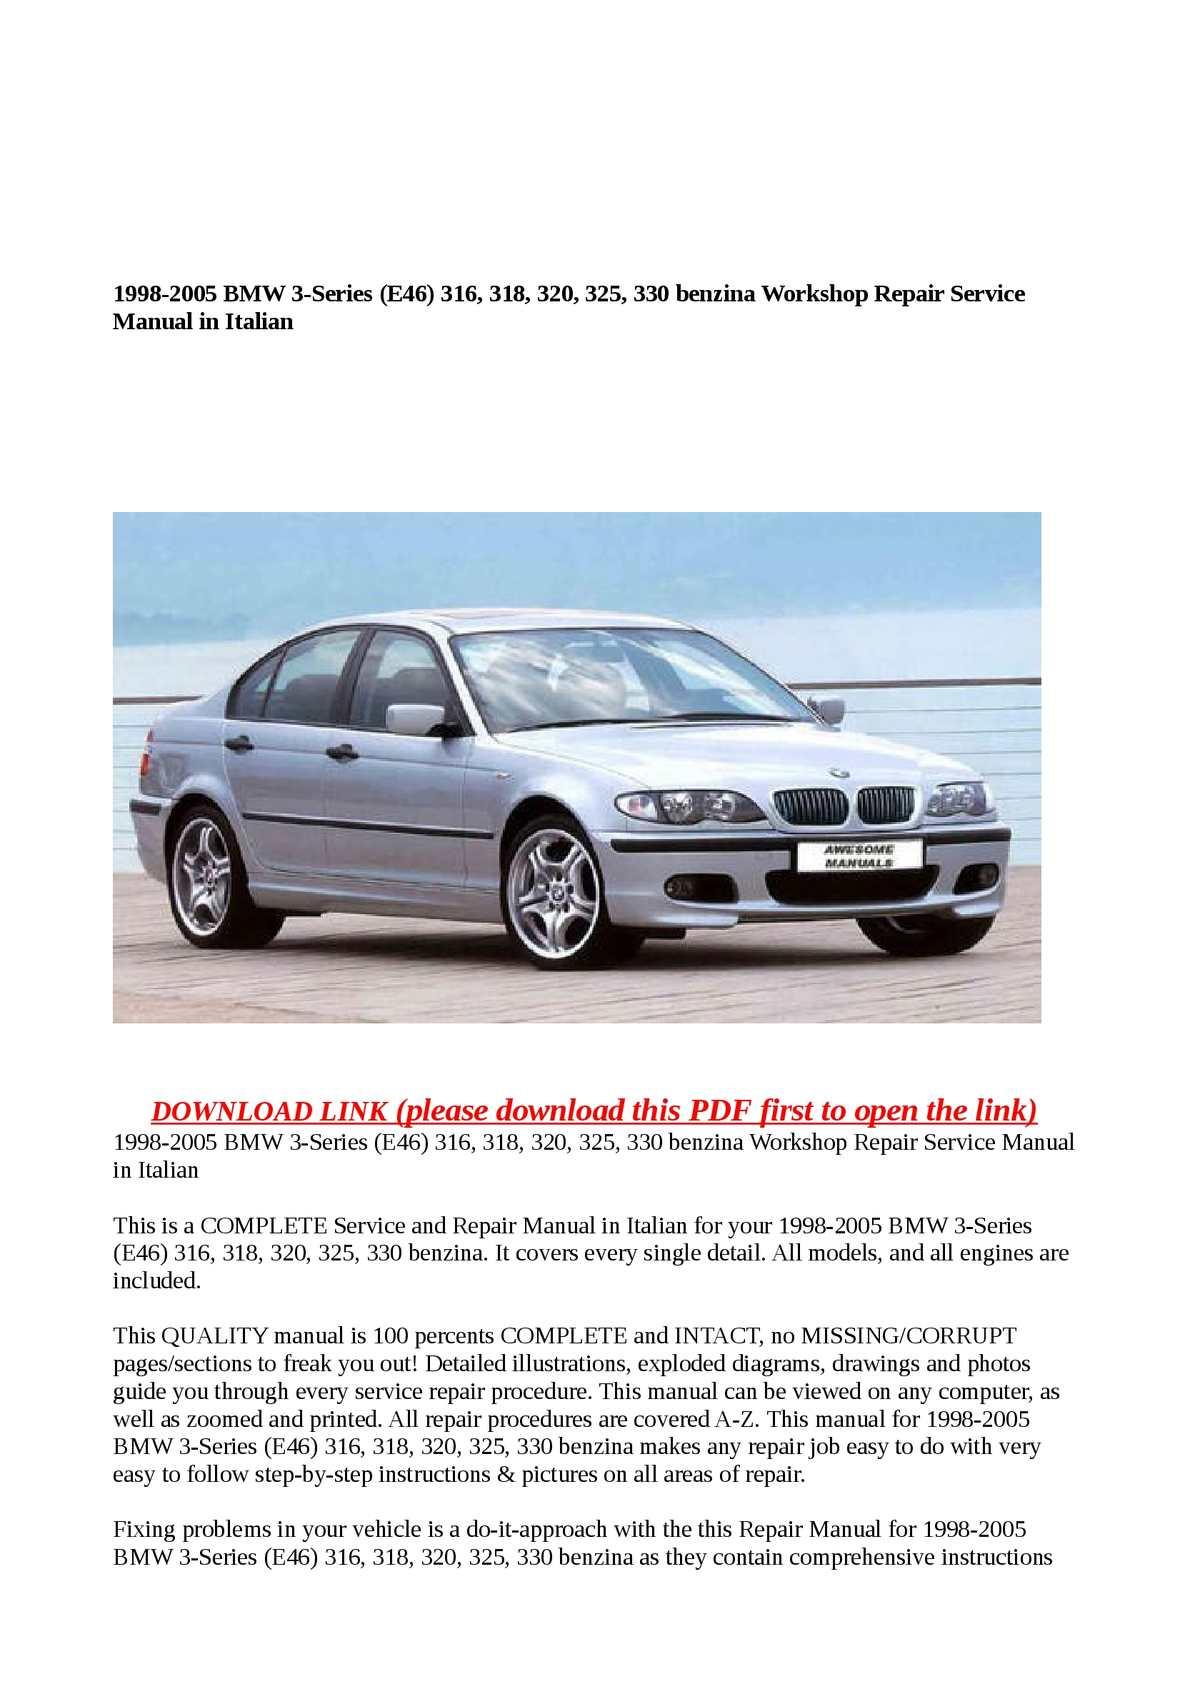 Calaméo - 1998-2005 BMW 3-Series (E46) 316, 318, 320, 325, 330 benzina Workshop  Repair Service Manual in Italian